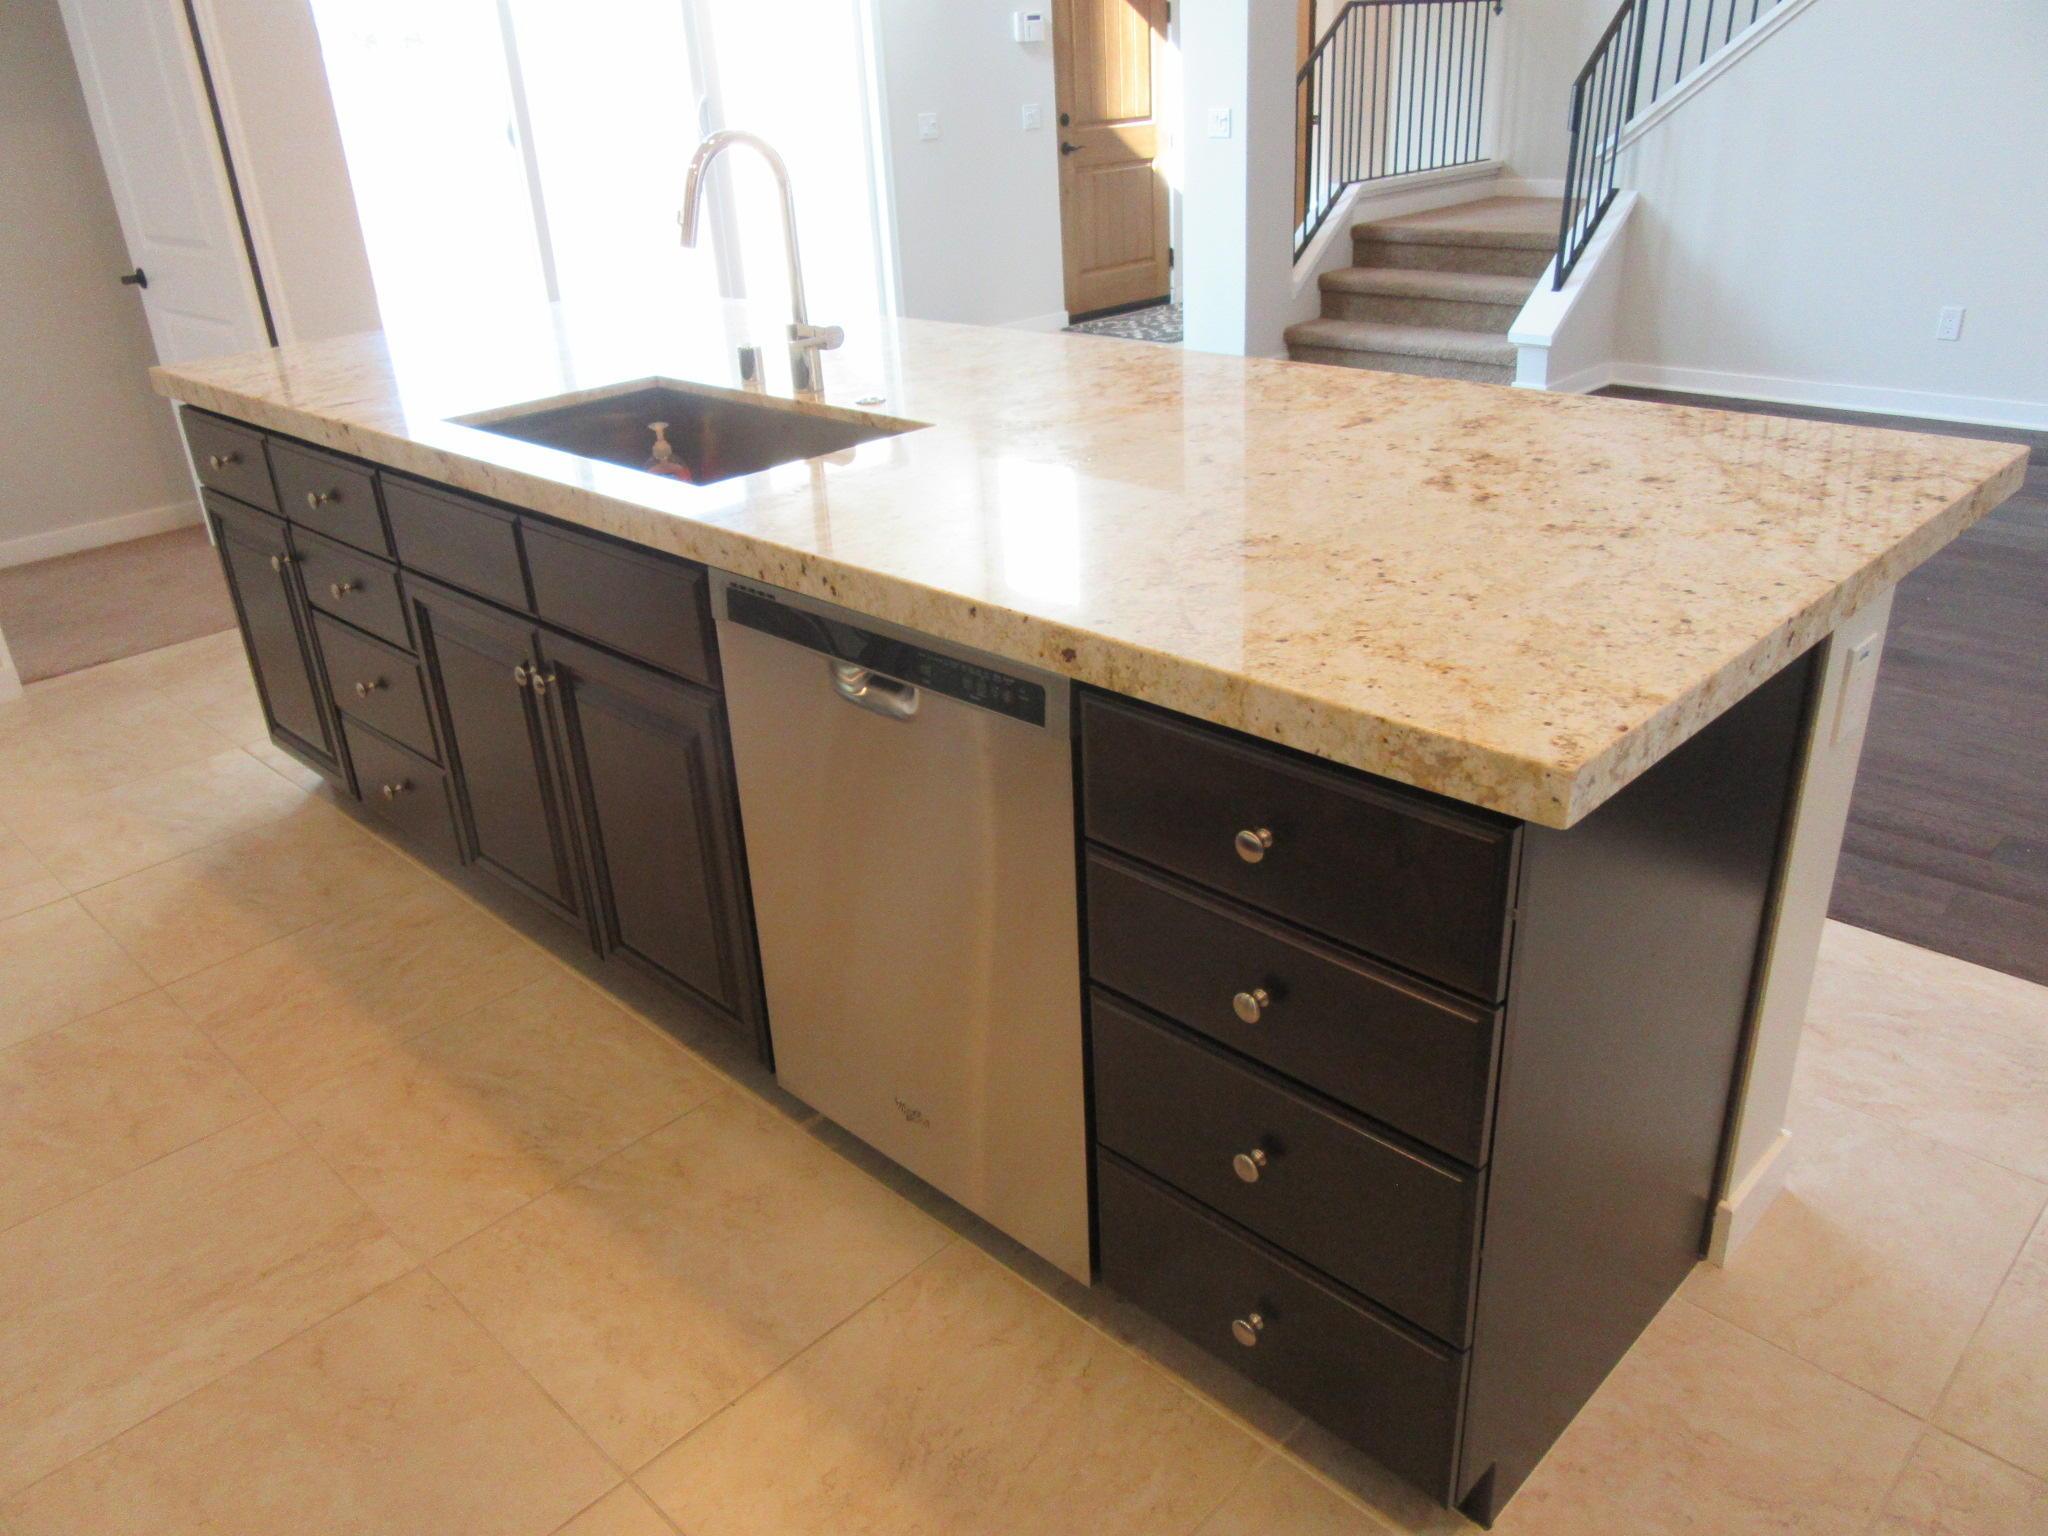 427 Limestone, Palm Springs, California 92262, 3 Bedrooms Bedrooms, ,3 BathroomsBathrooms,Residential,For Sale,427 Limestone,219038960